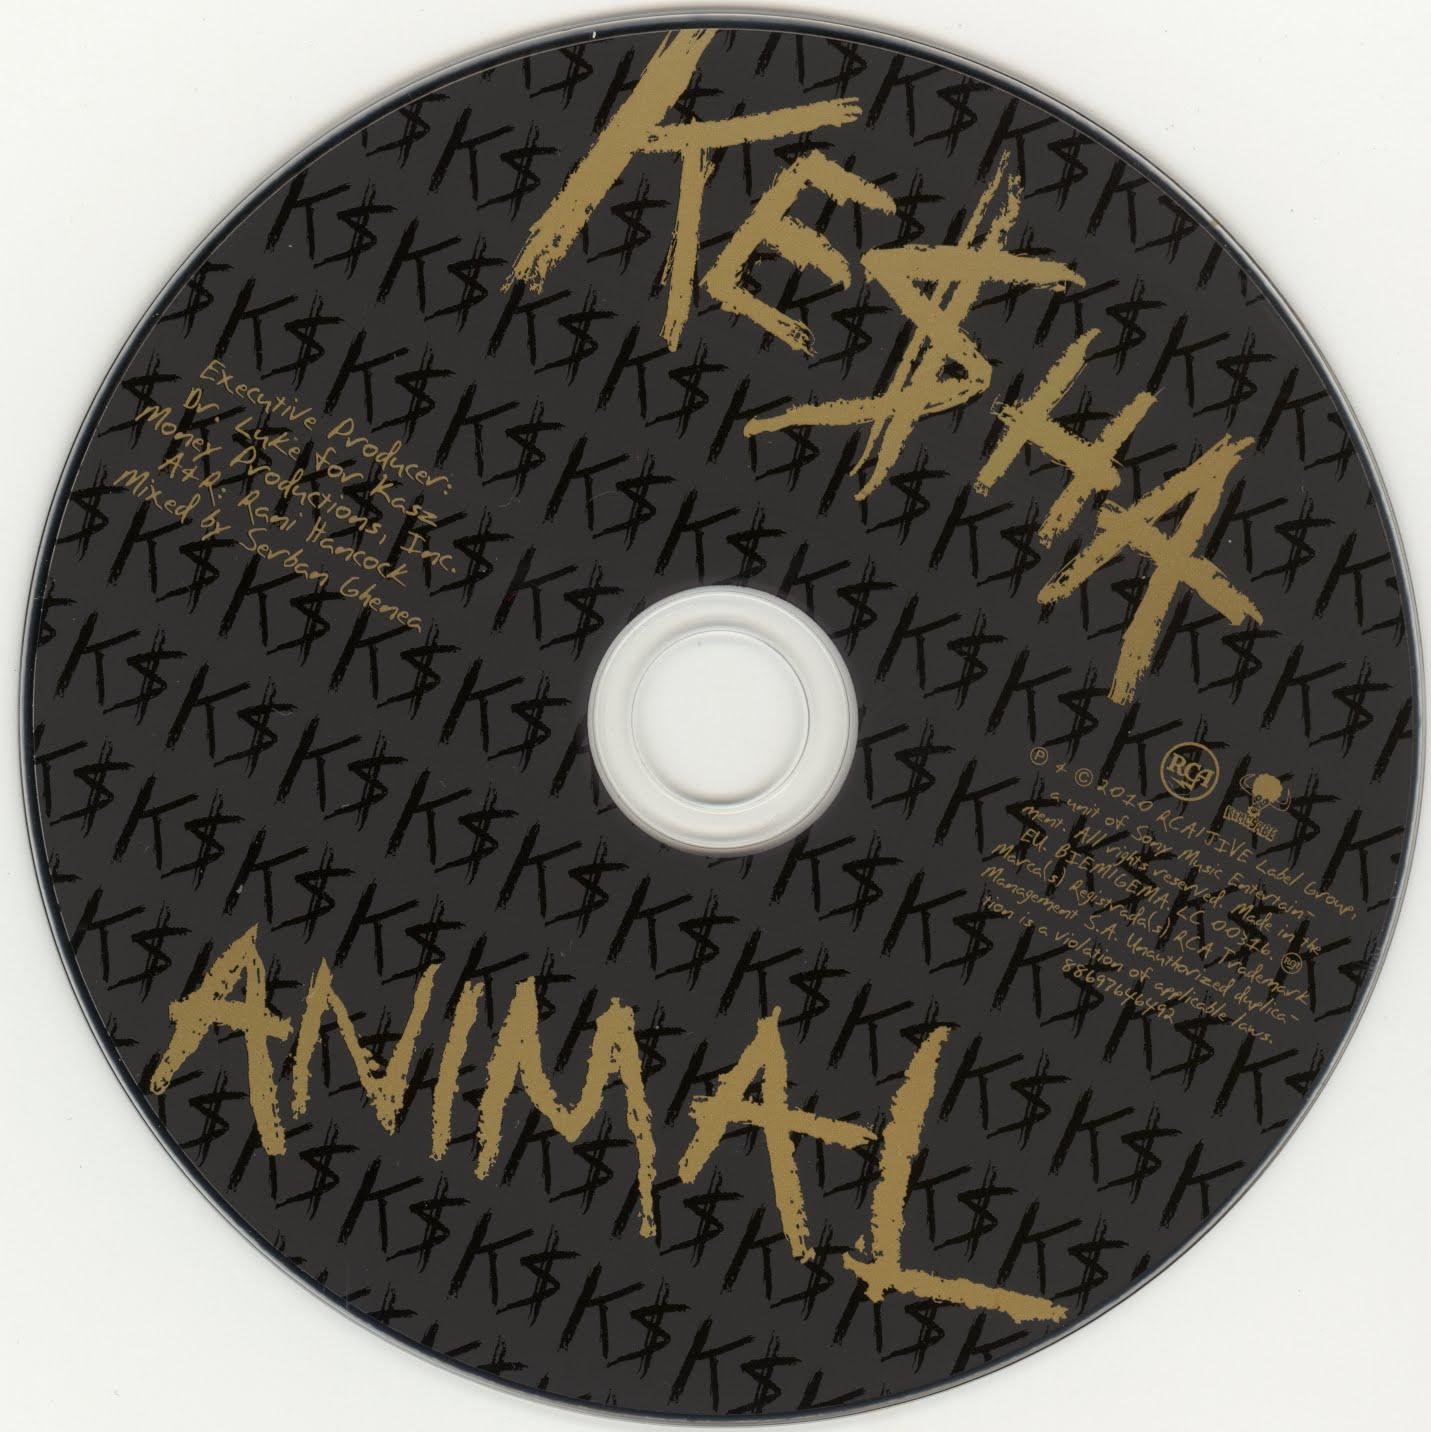 http://1.bp.blogspot.com/_iK8pXbu-0r0/TLbWSn5anJI/AAAAAAAAAg0/roz6D4DcISo/s1600/Kesha_-_Animal_%255BCD%255D.jpg